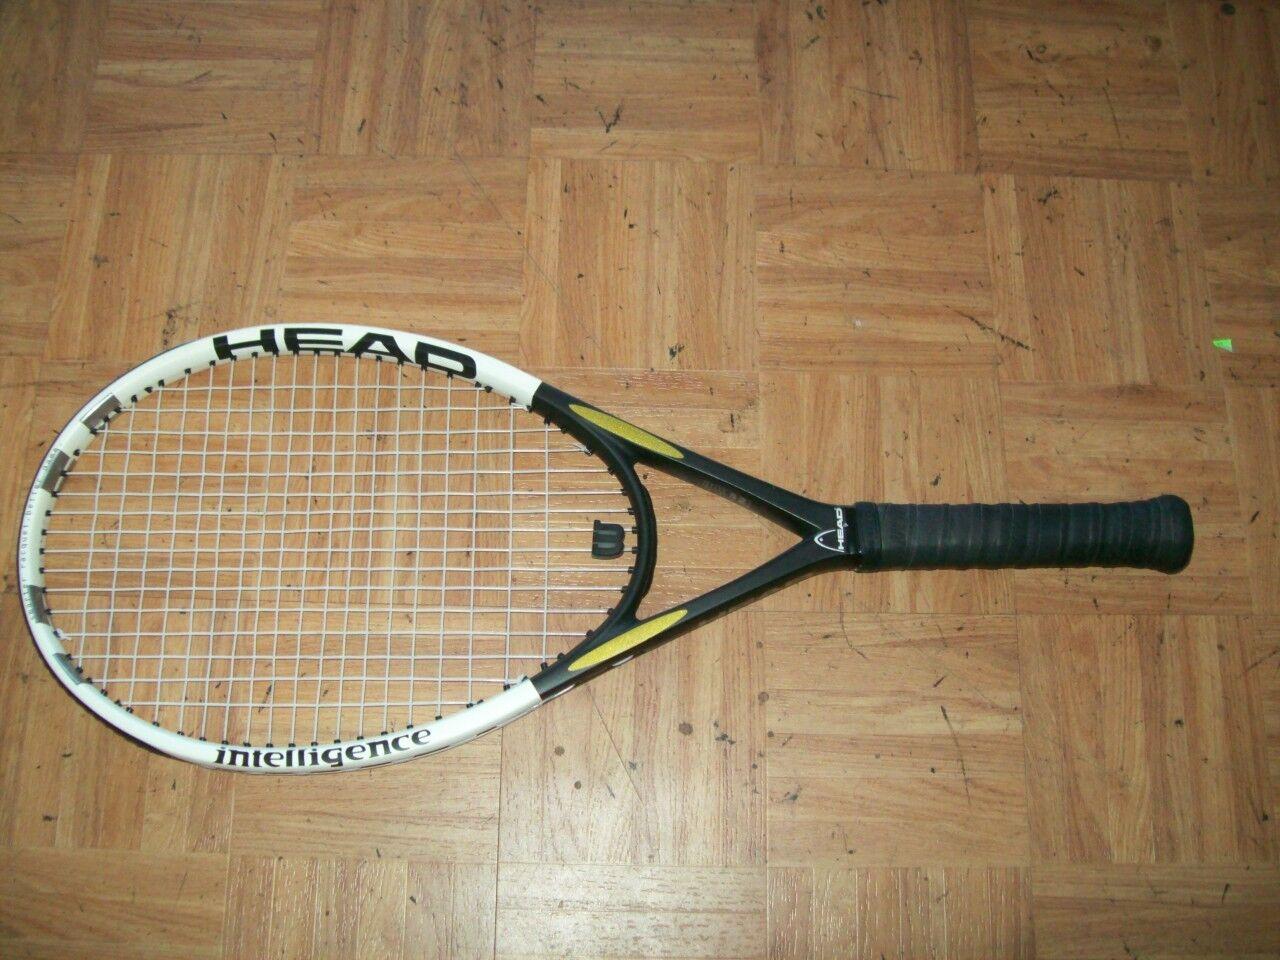 Head I. S2 Oversize Made in Austria 4 3/8 grip Tennis Racquet